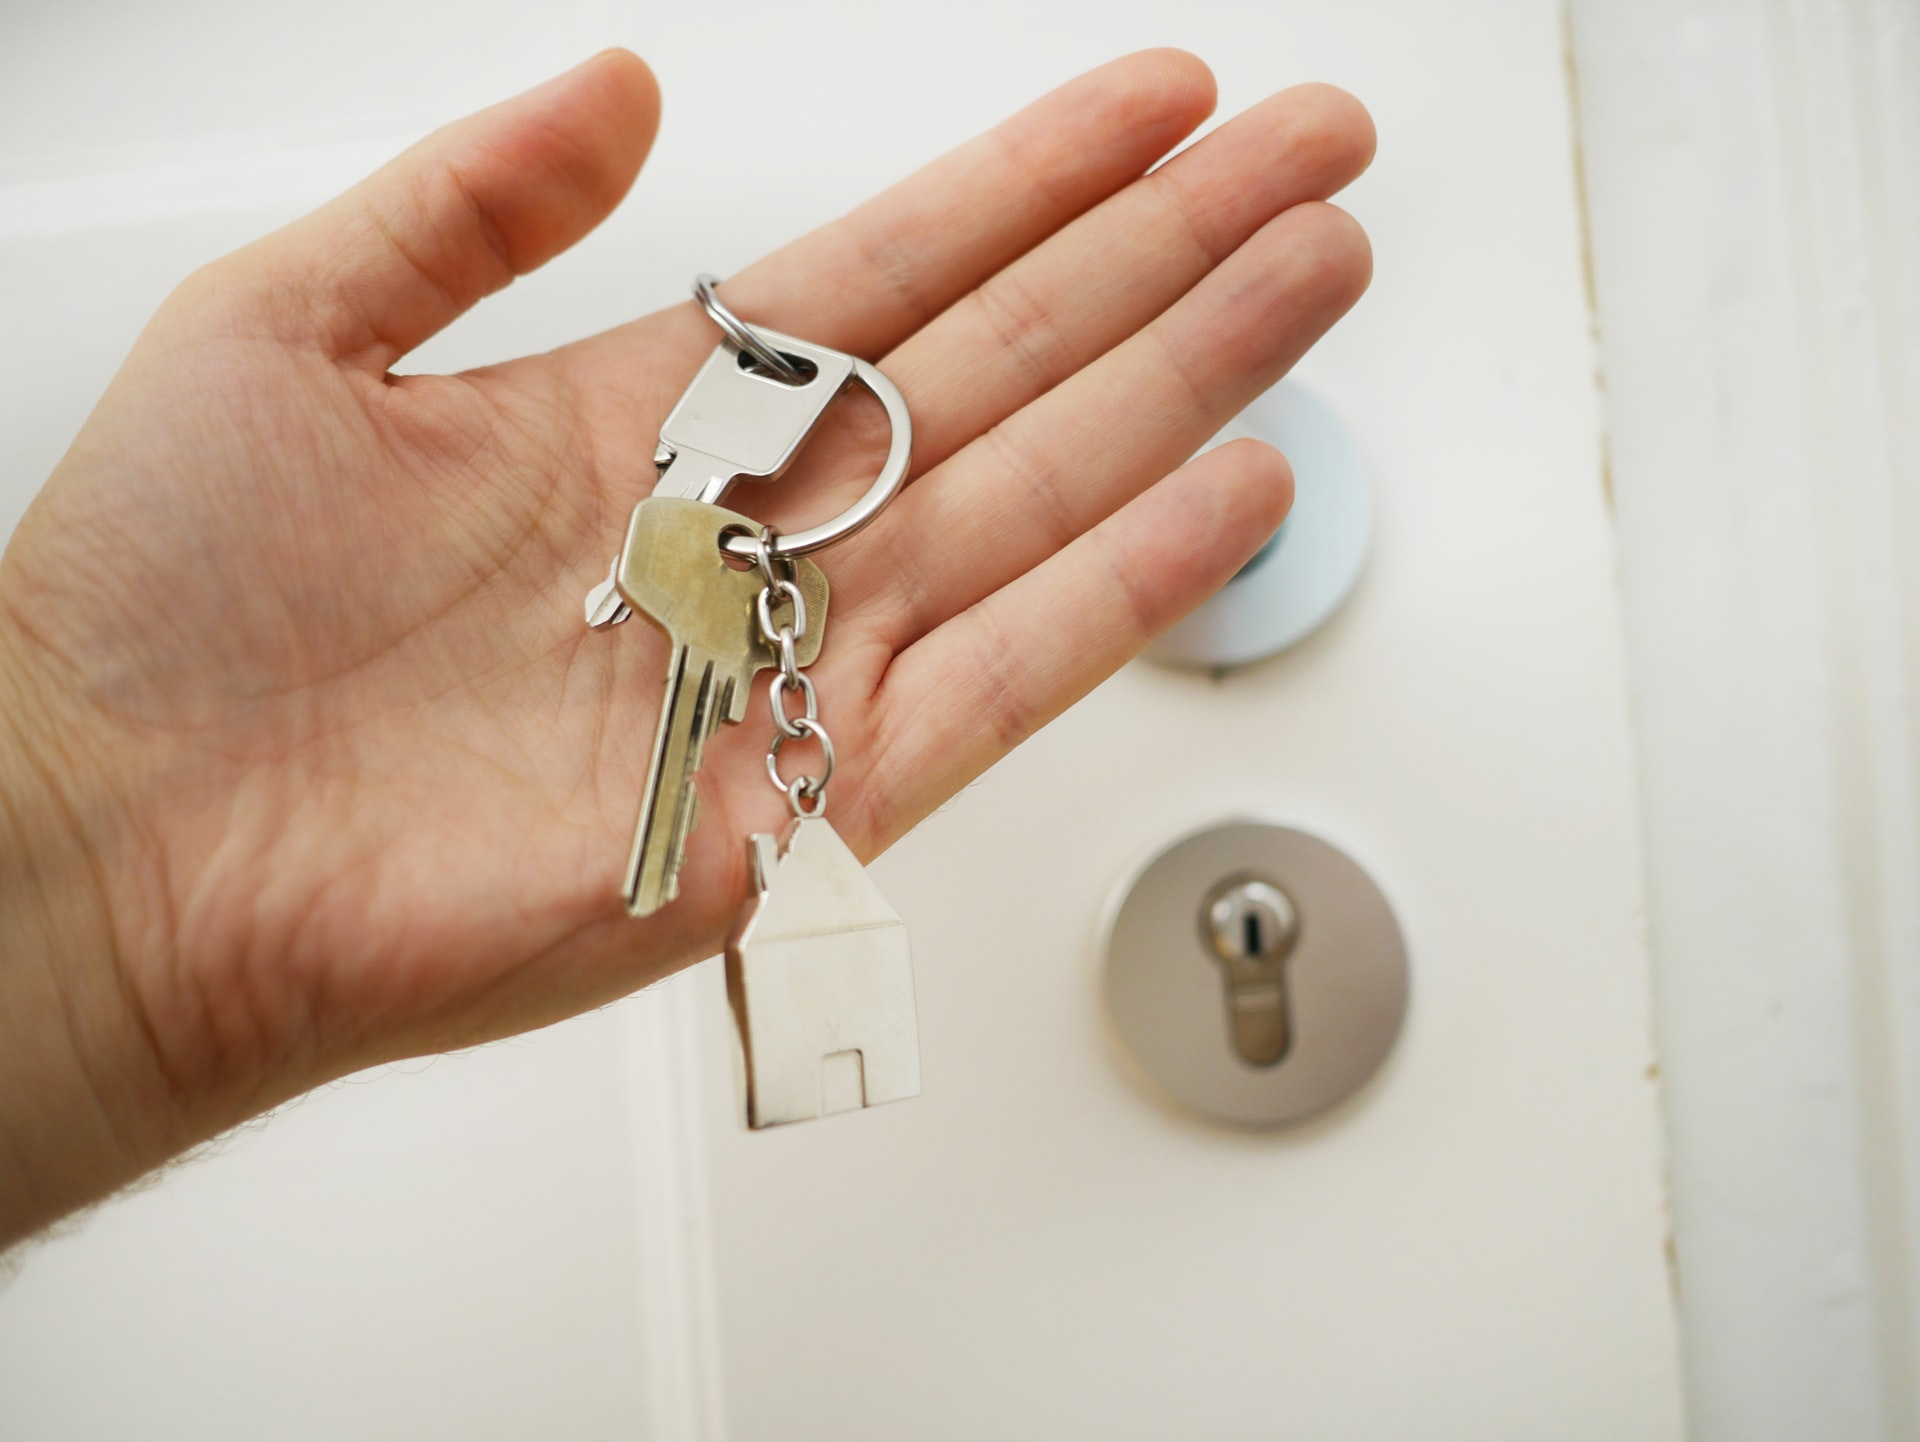 Quick House Sale Company Header Image